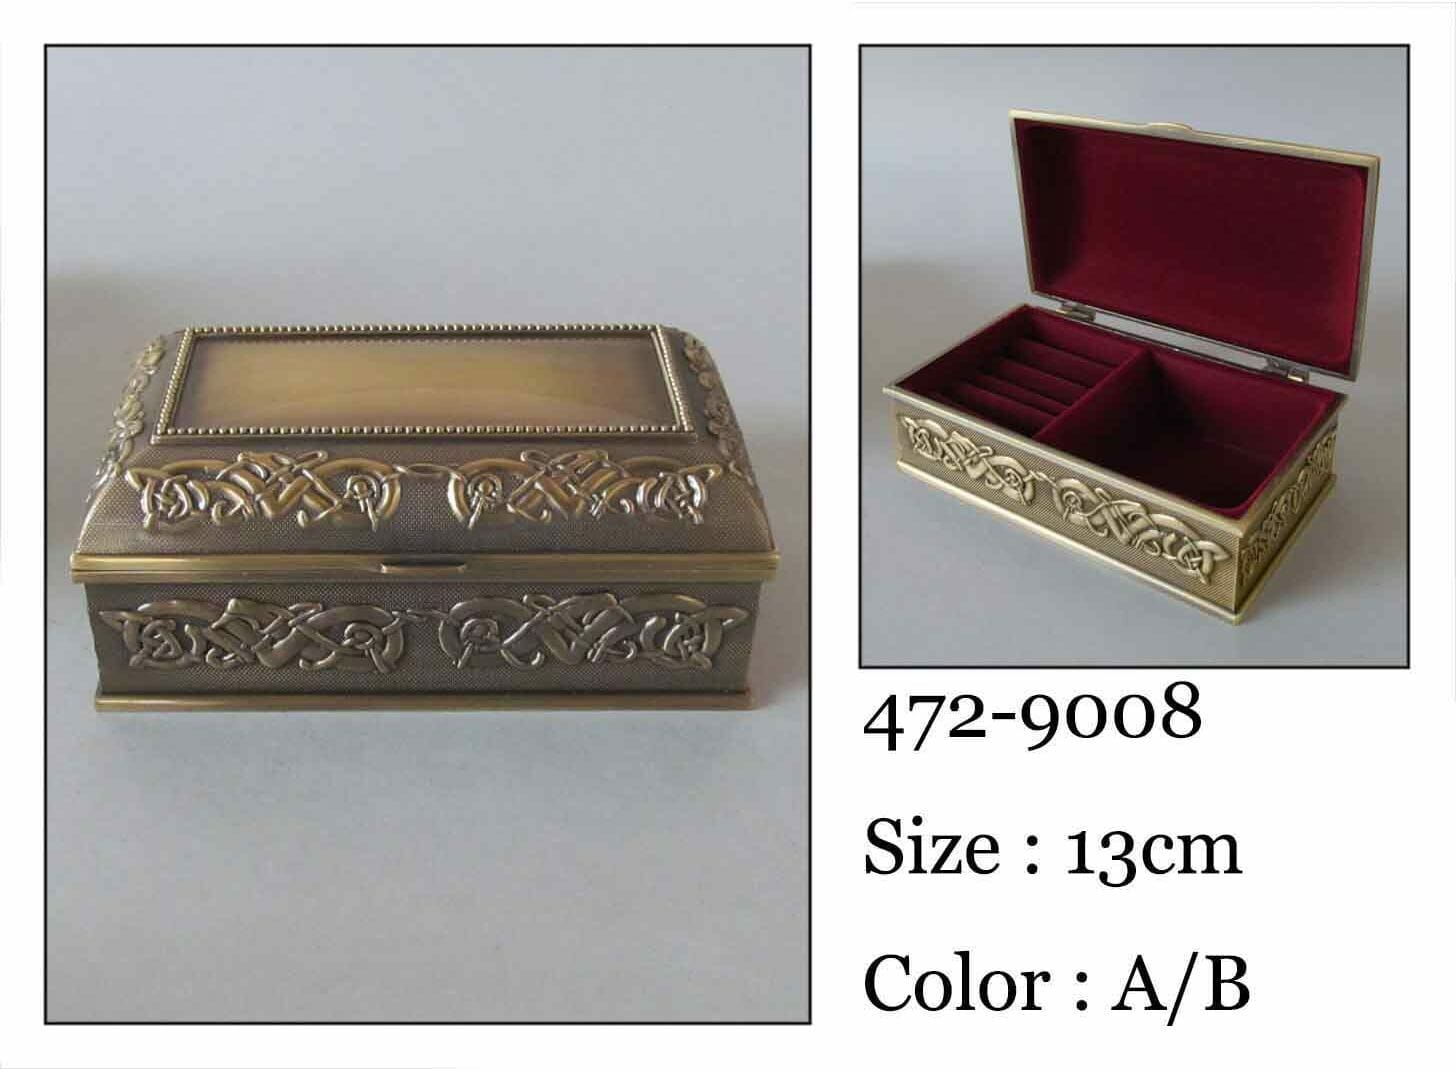 Kasetka, stare złoto, 13x7,5 cm